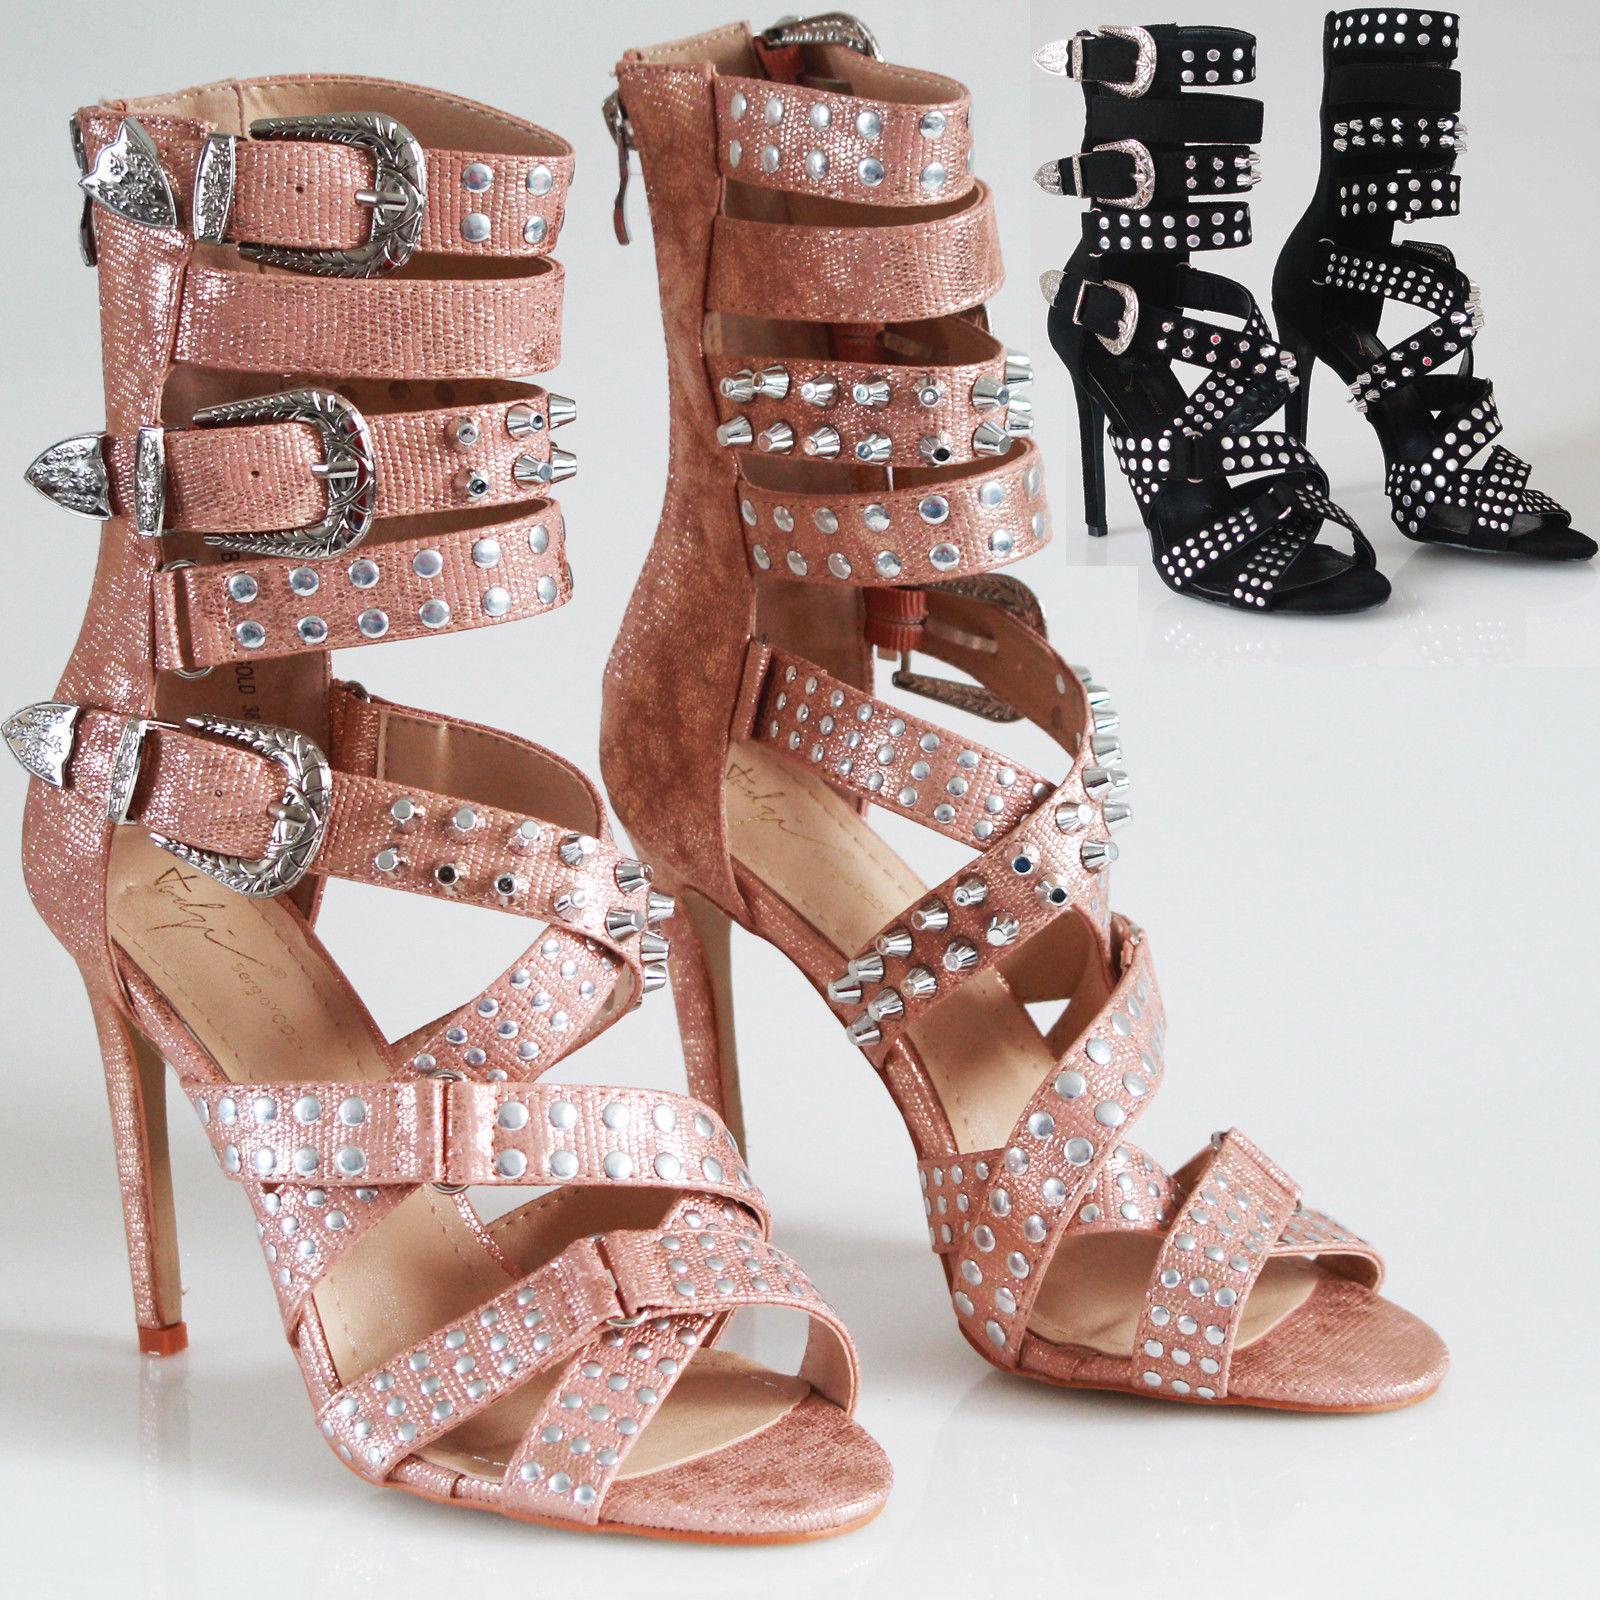 Girls Womens Heels Studded Ankle Strap High Heels Womens Rivet Gladiators Pointy Sandal Shoes 732c8f